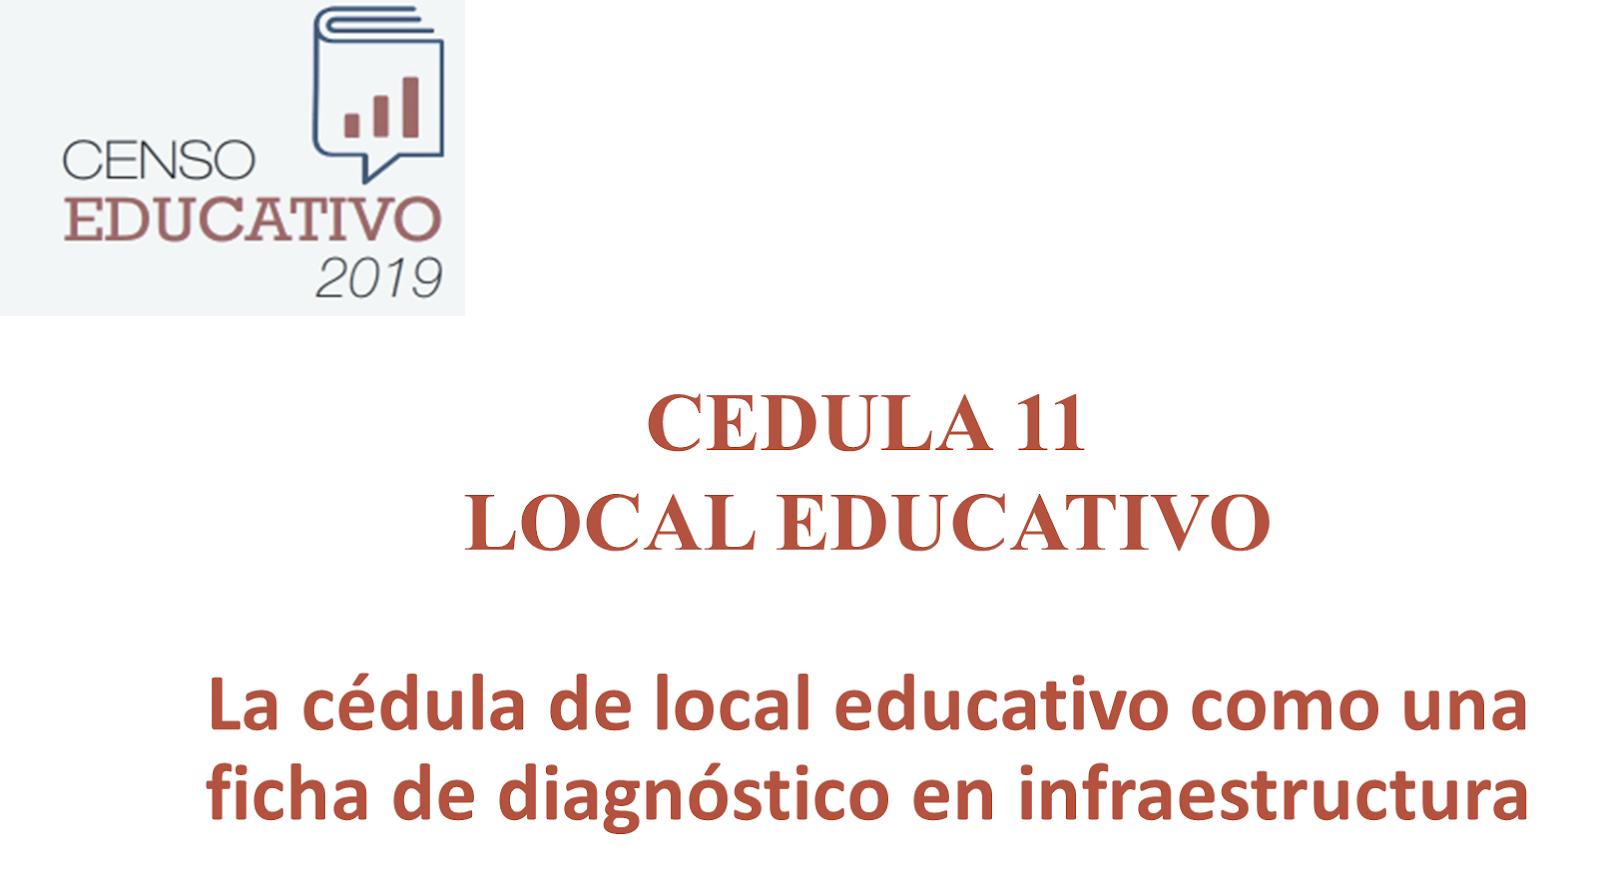 CENSOS EDUCATIVO 2019 LOCAL ESCOLAR